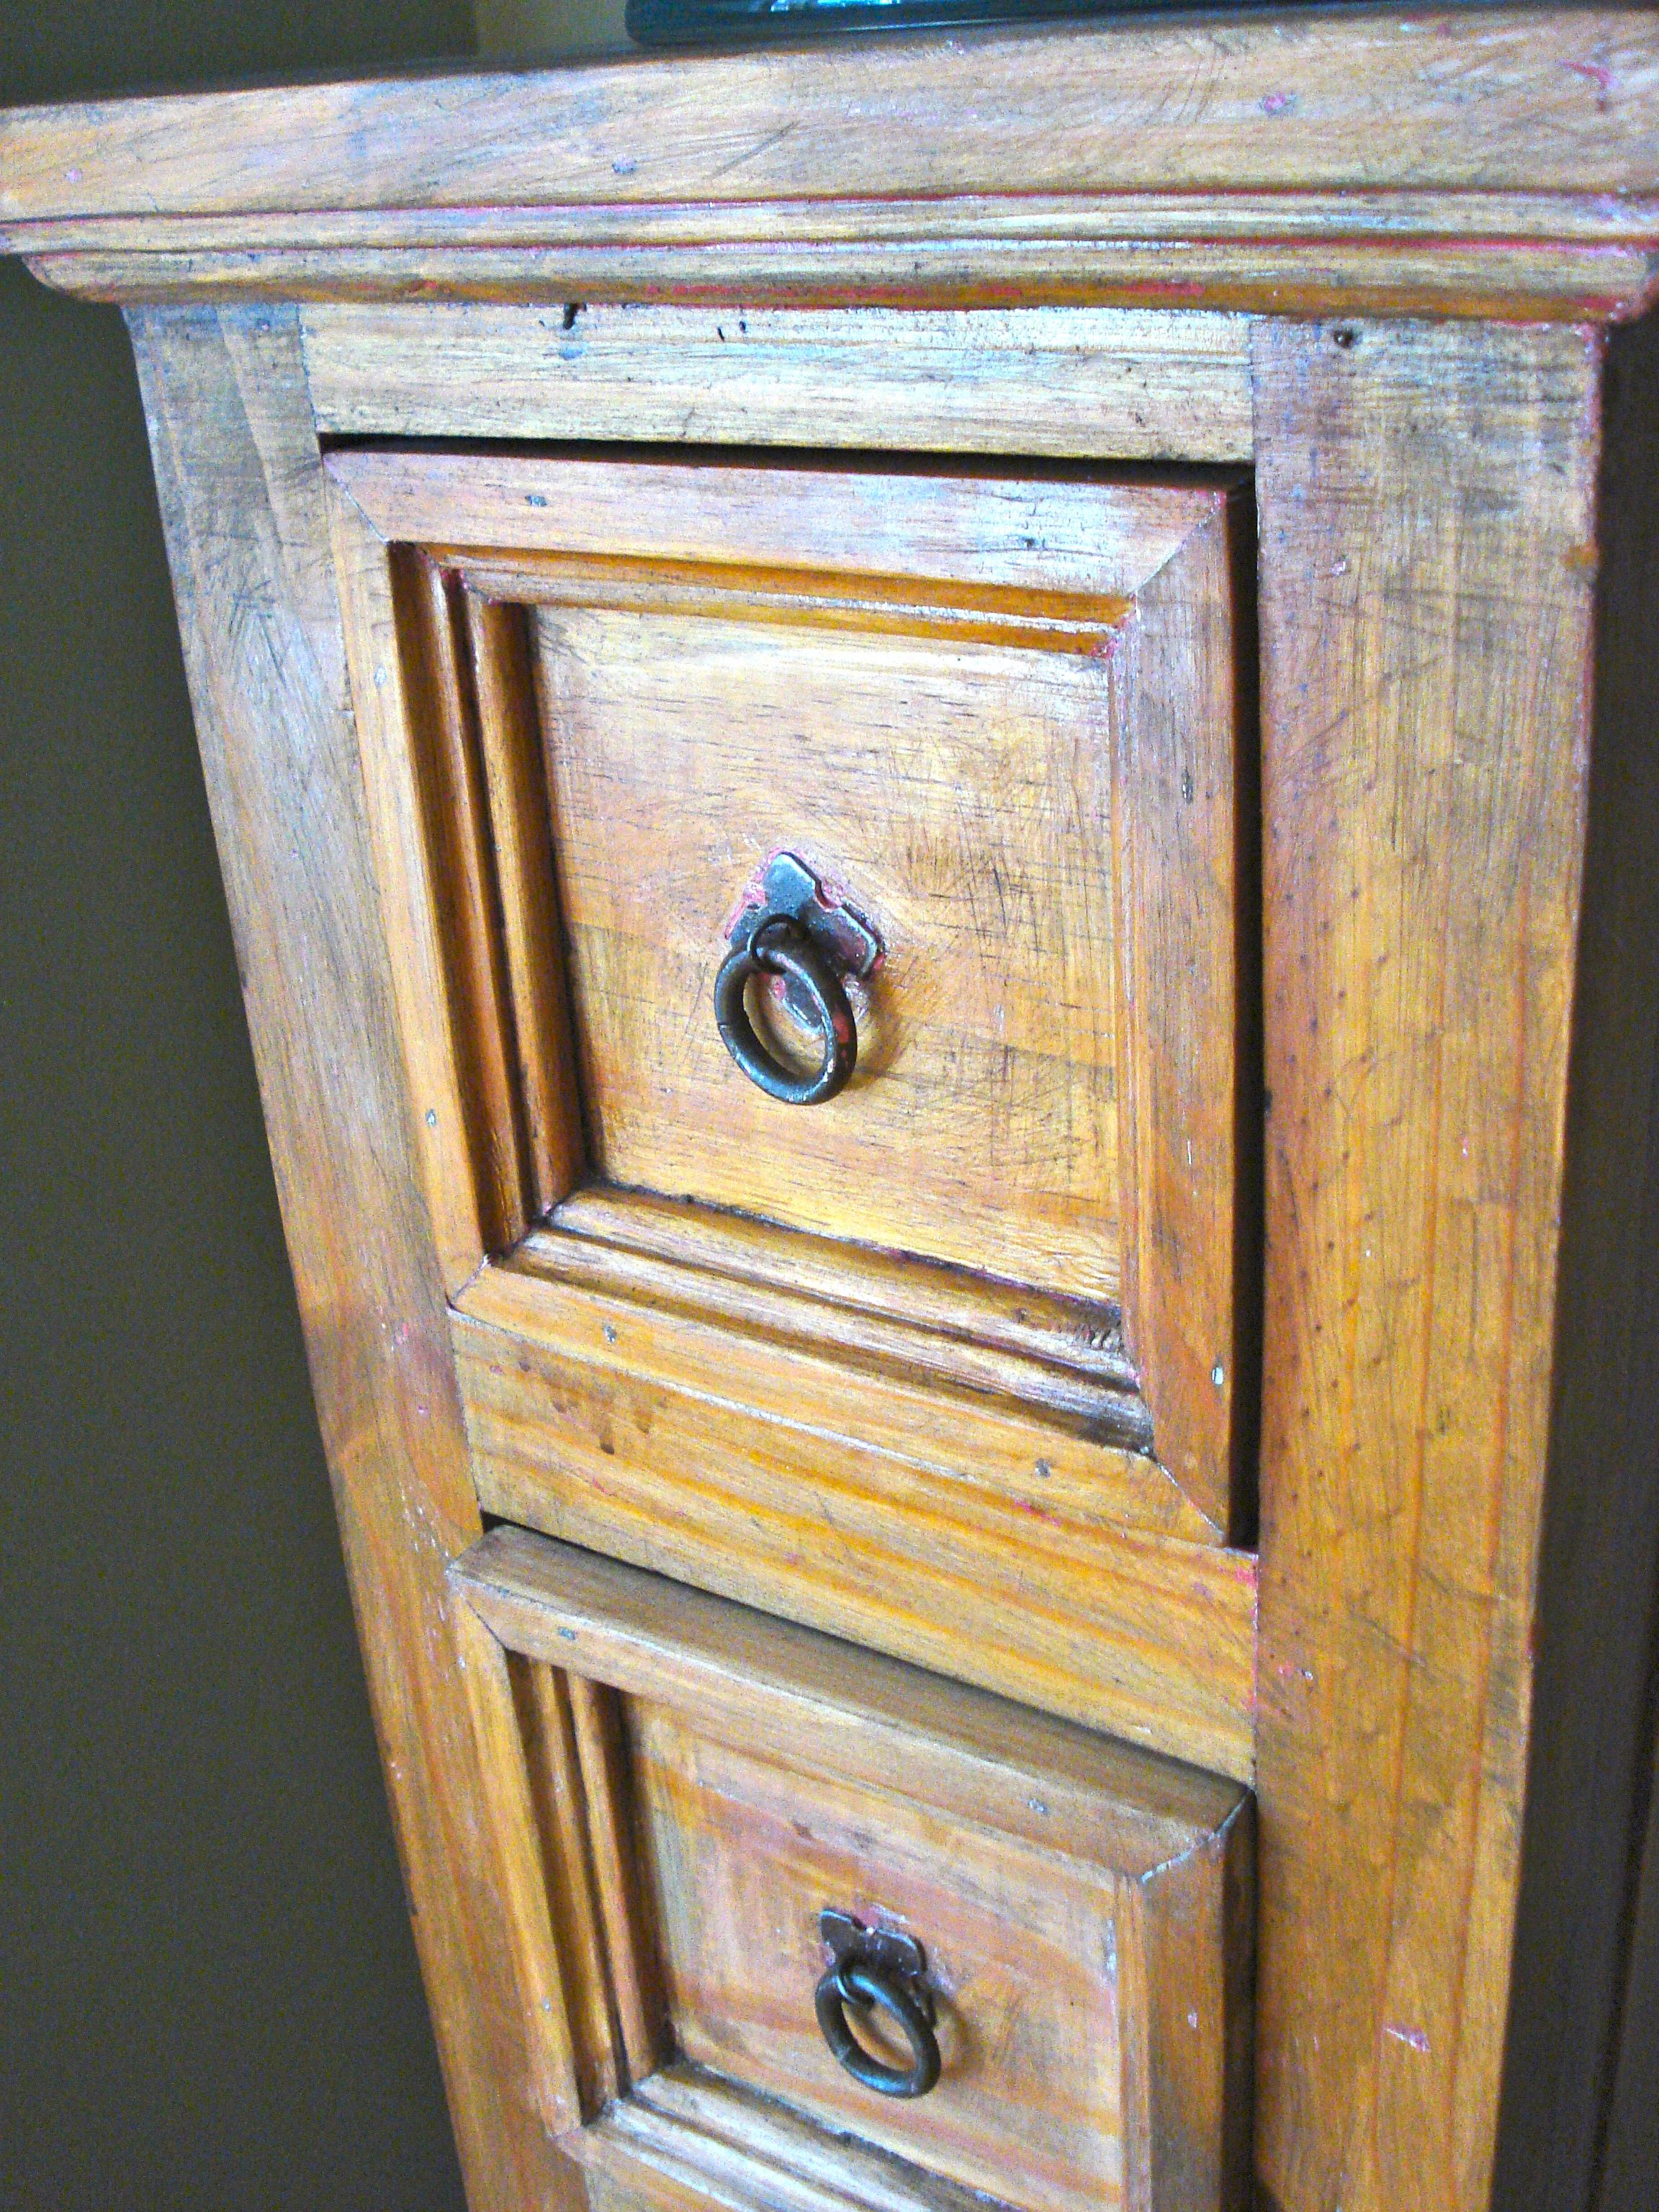 Repurposed Furniture repurposed furniture | ihavetriedit